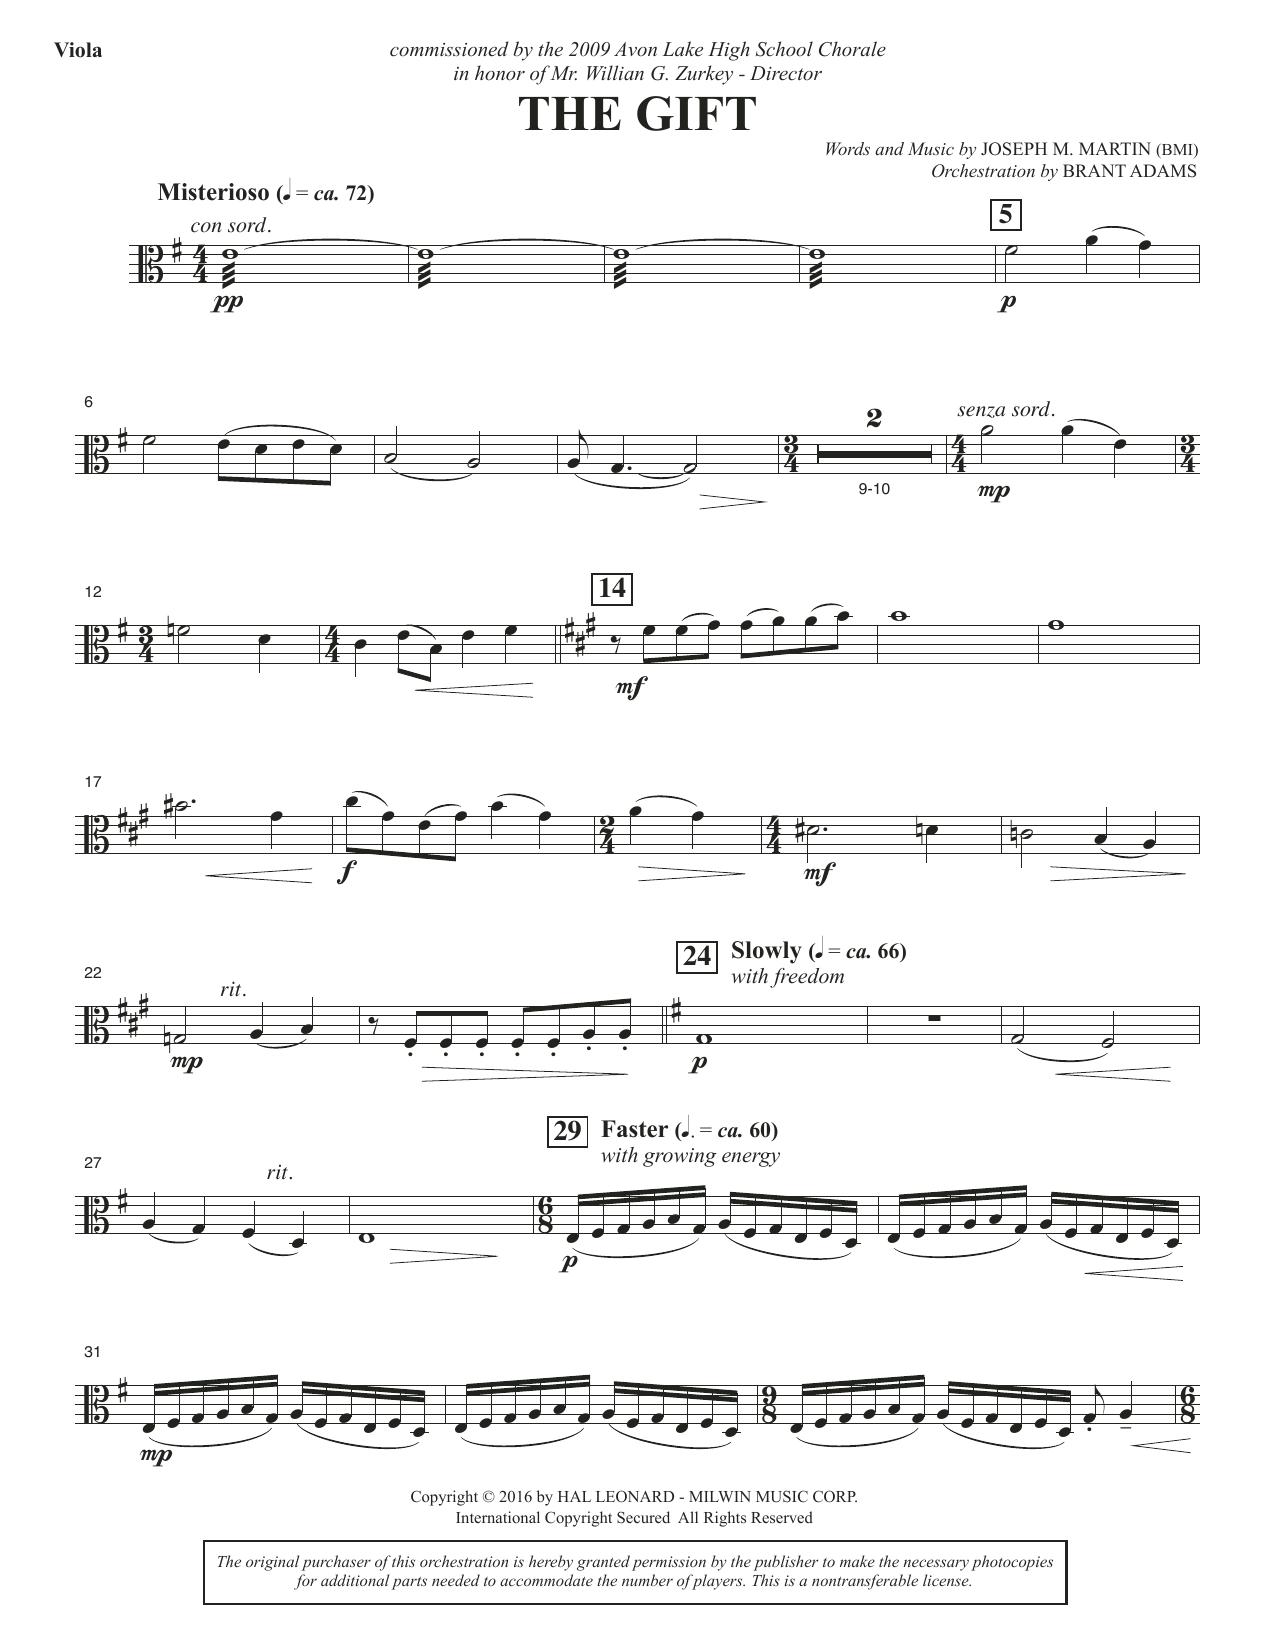 The Gift - Viola Sheet Music